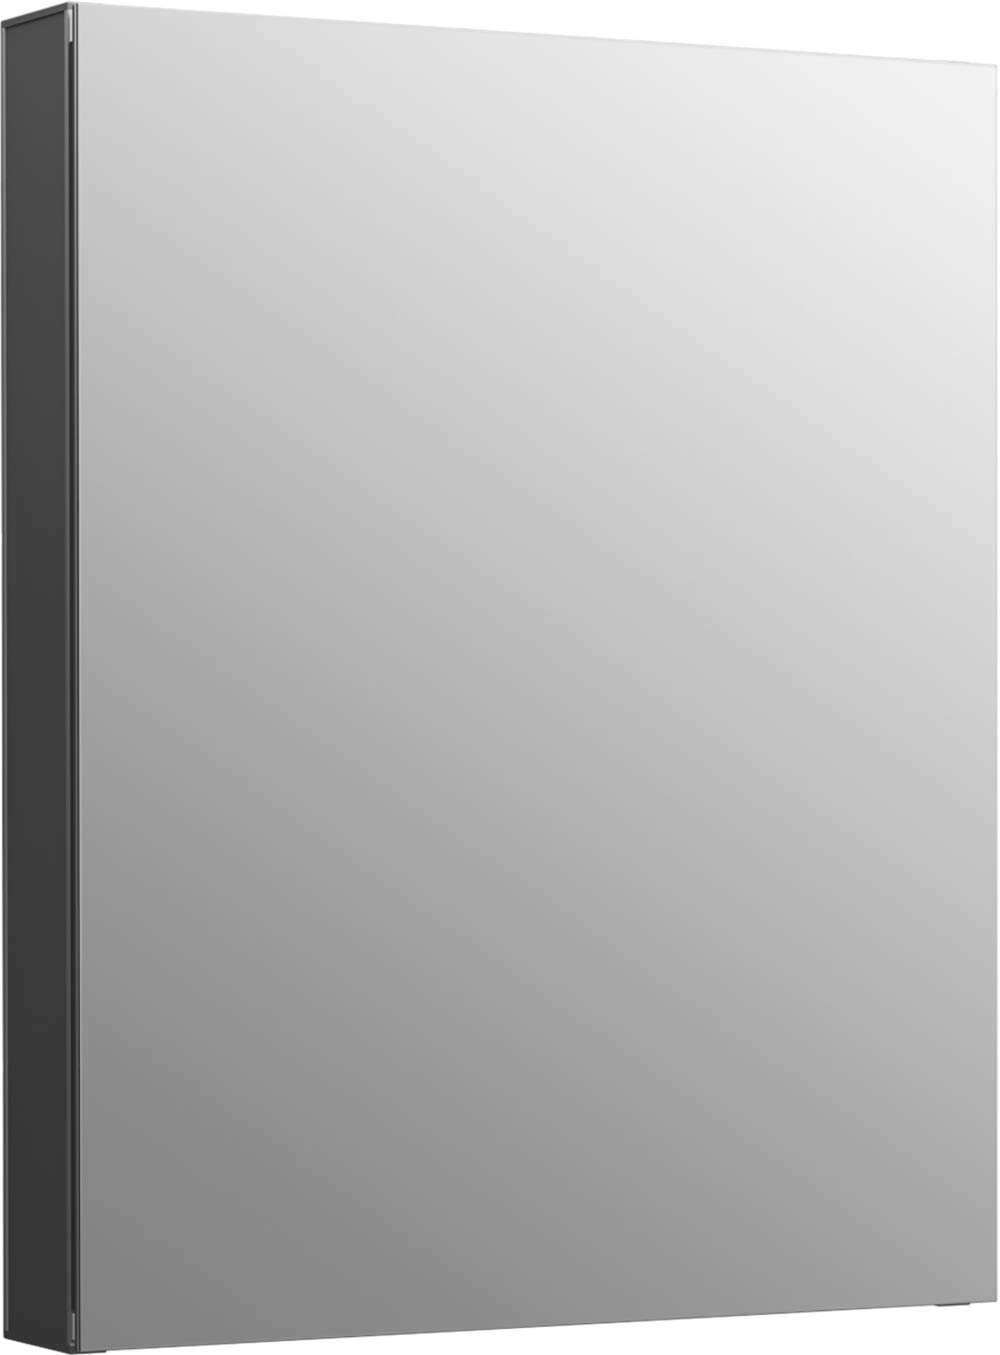 Kohler K-81145-DA1 Maxstow Frameless Surface Mount Bathroom Medicine Cabinet, 20'' x 24'', Dark Anodized Aluminum